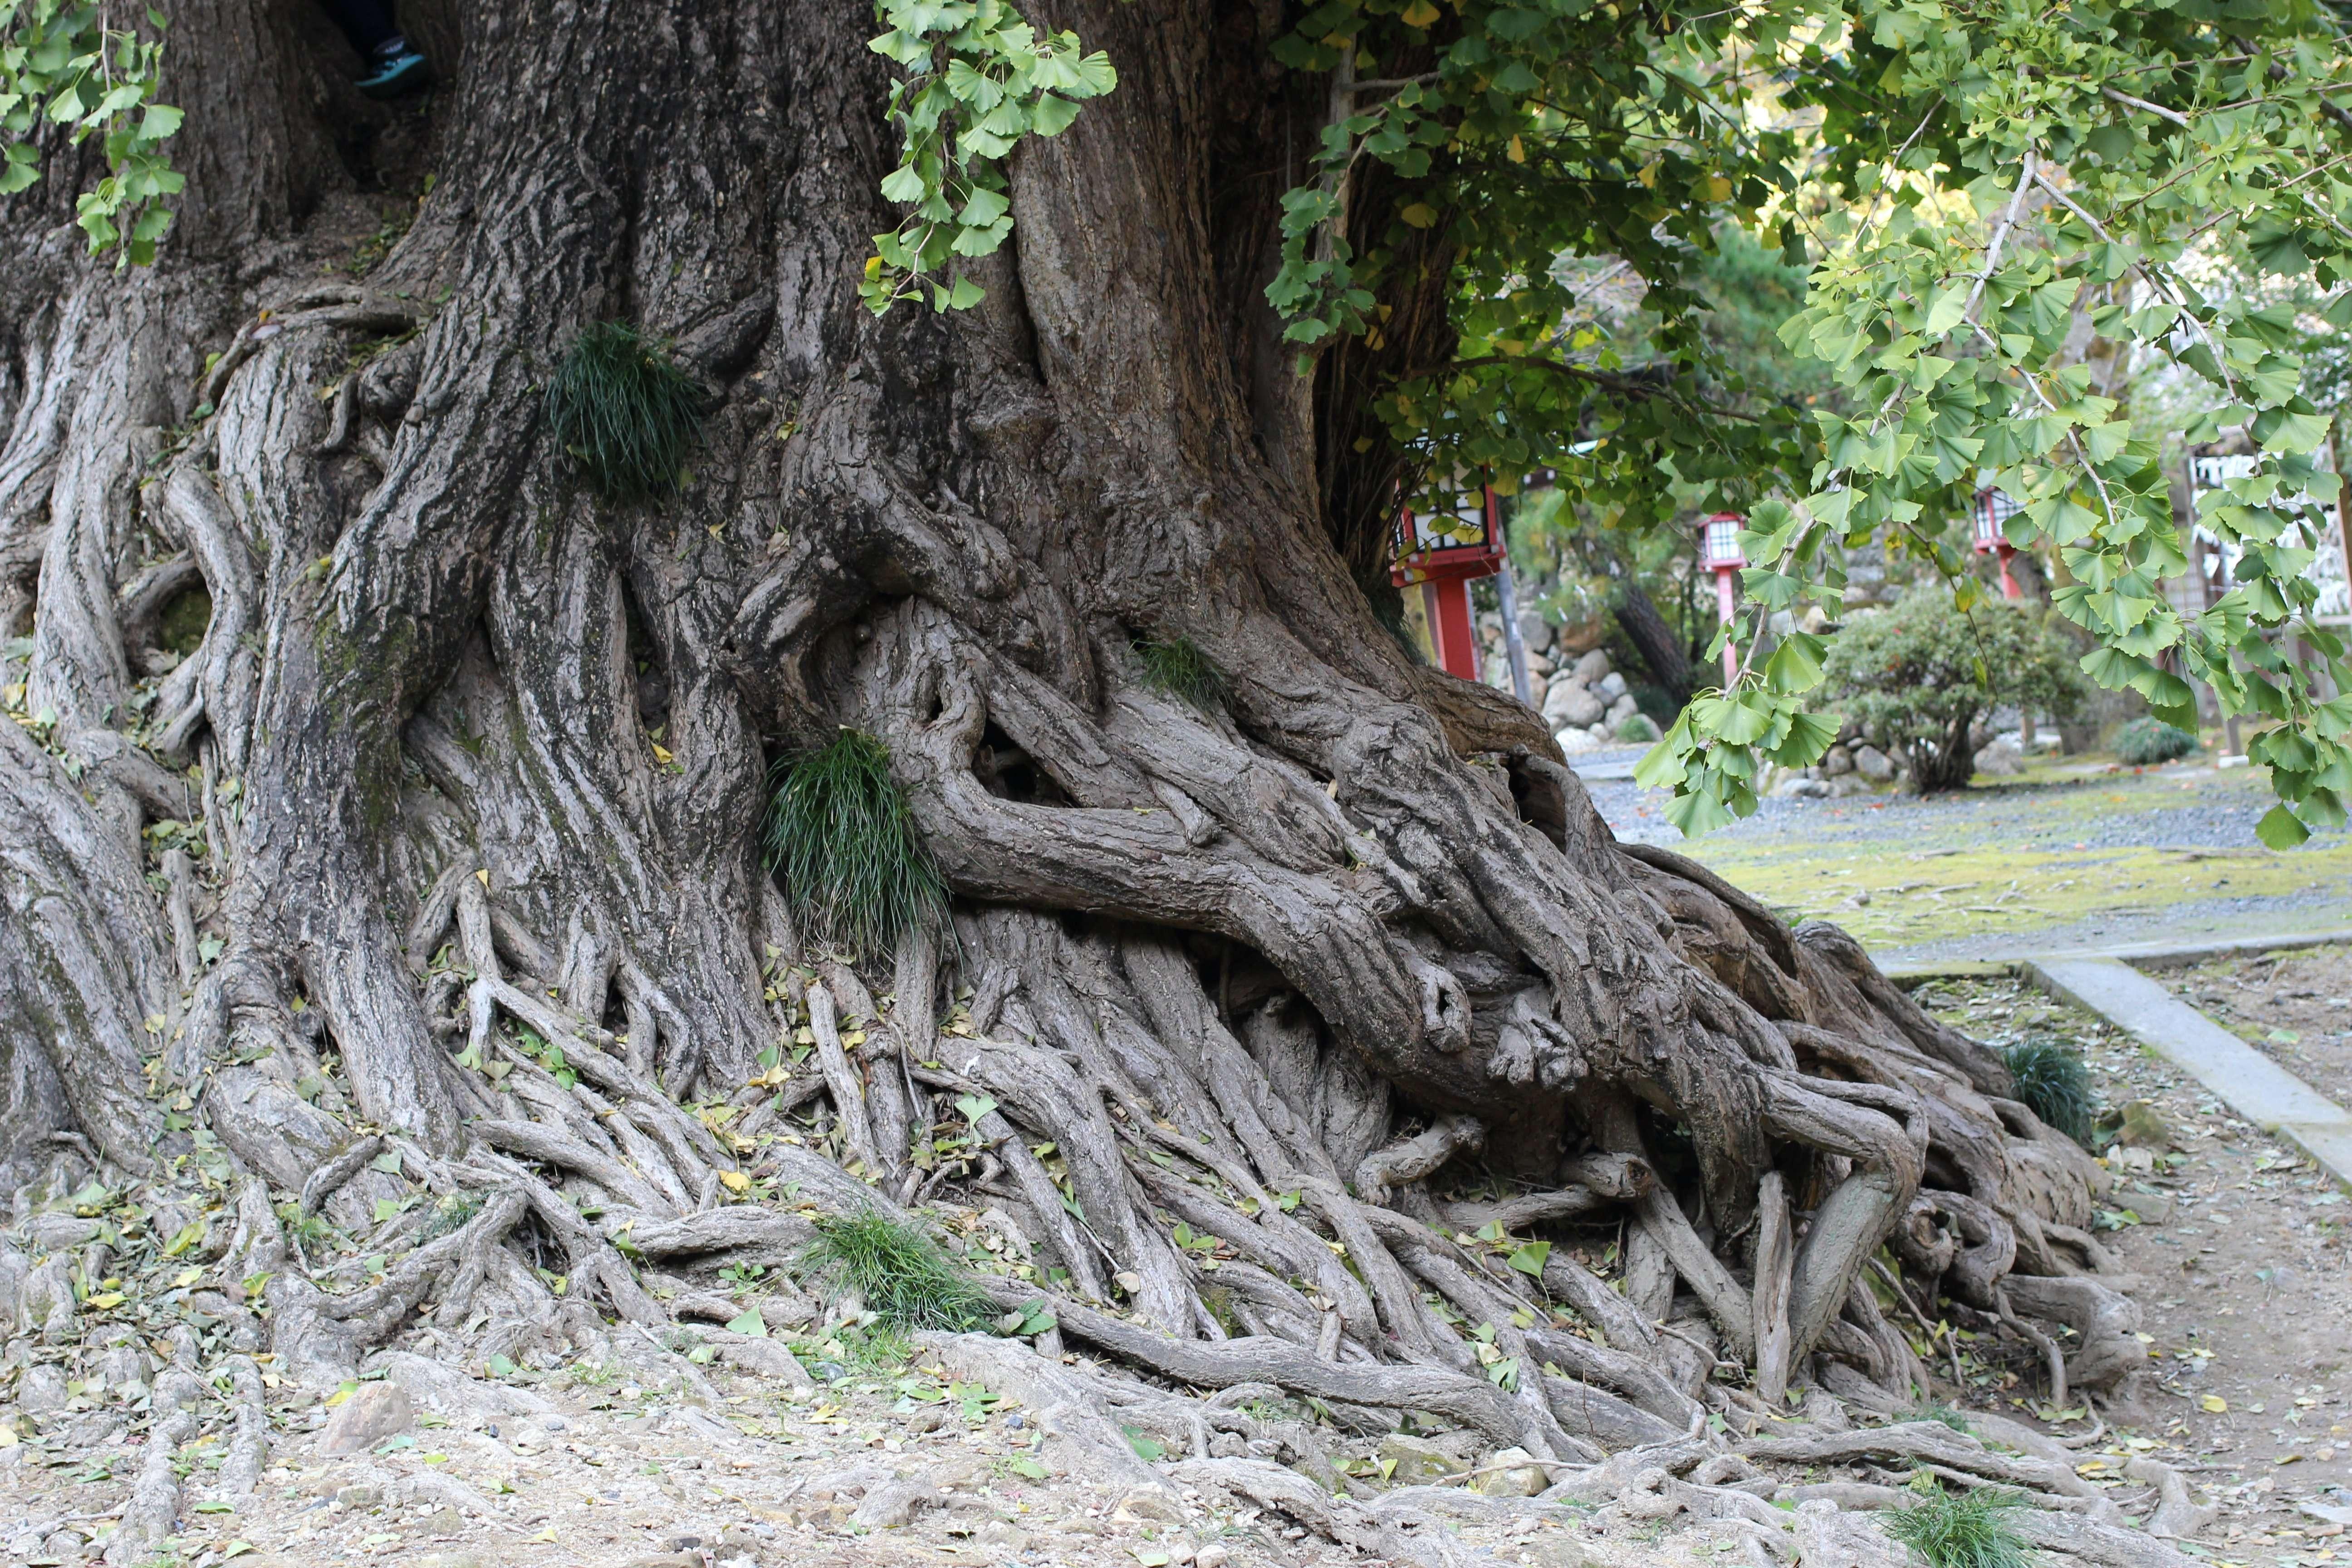 Shoboji's legendary gingko tree's roots